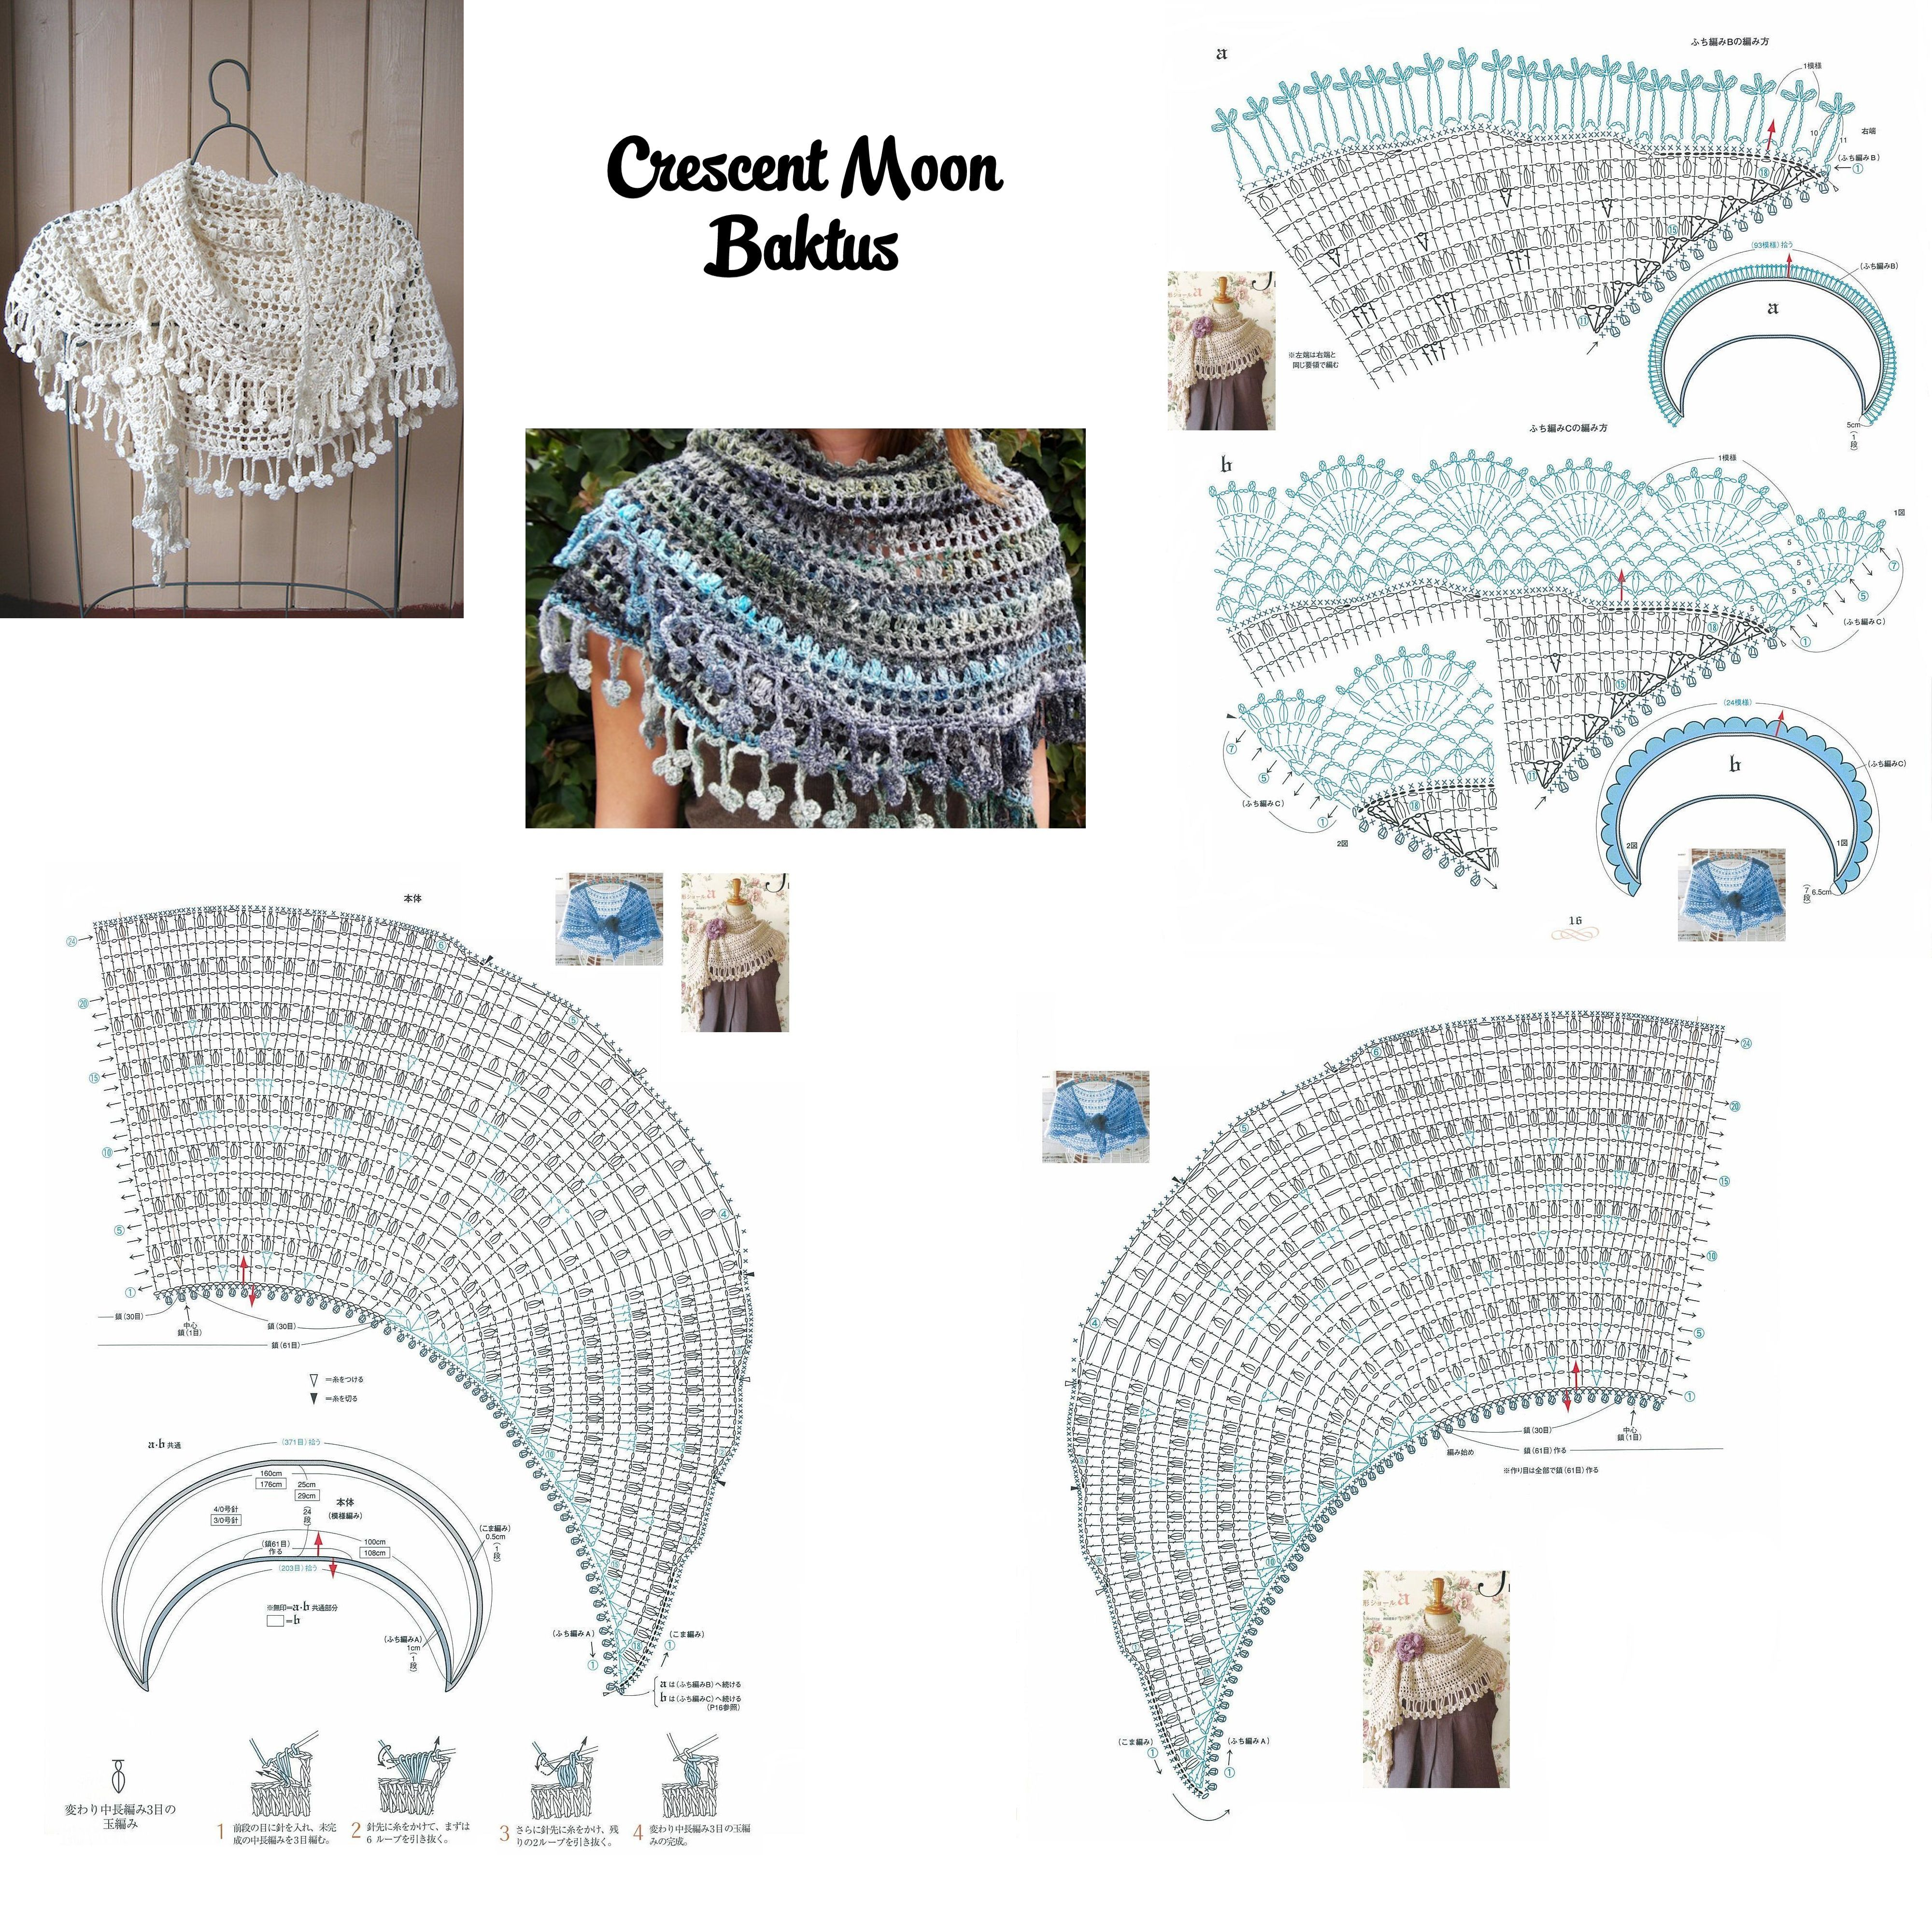 Crochet Crescent Moon Baktus | Шали,палантины,бактусы. | Pinterest ...